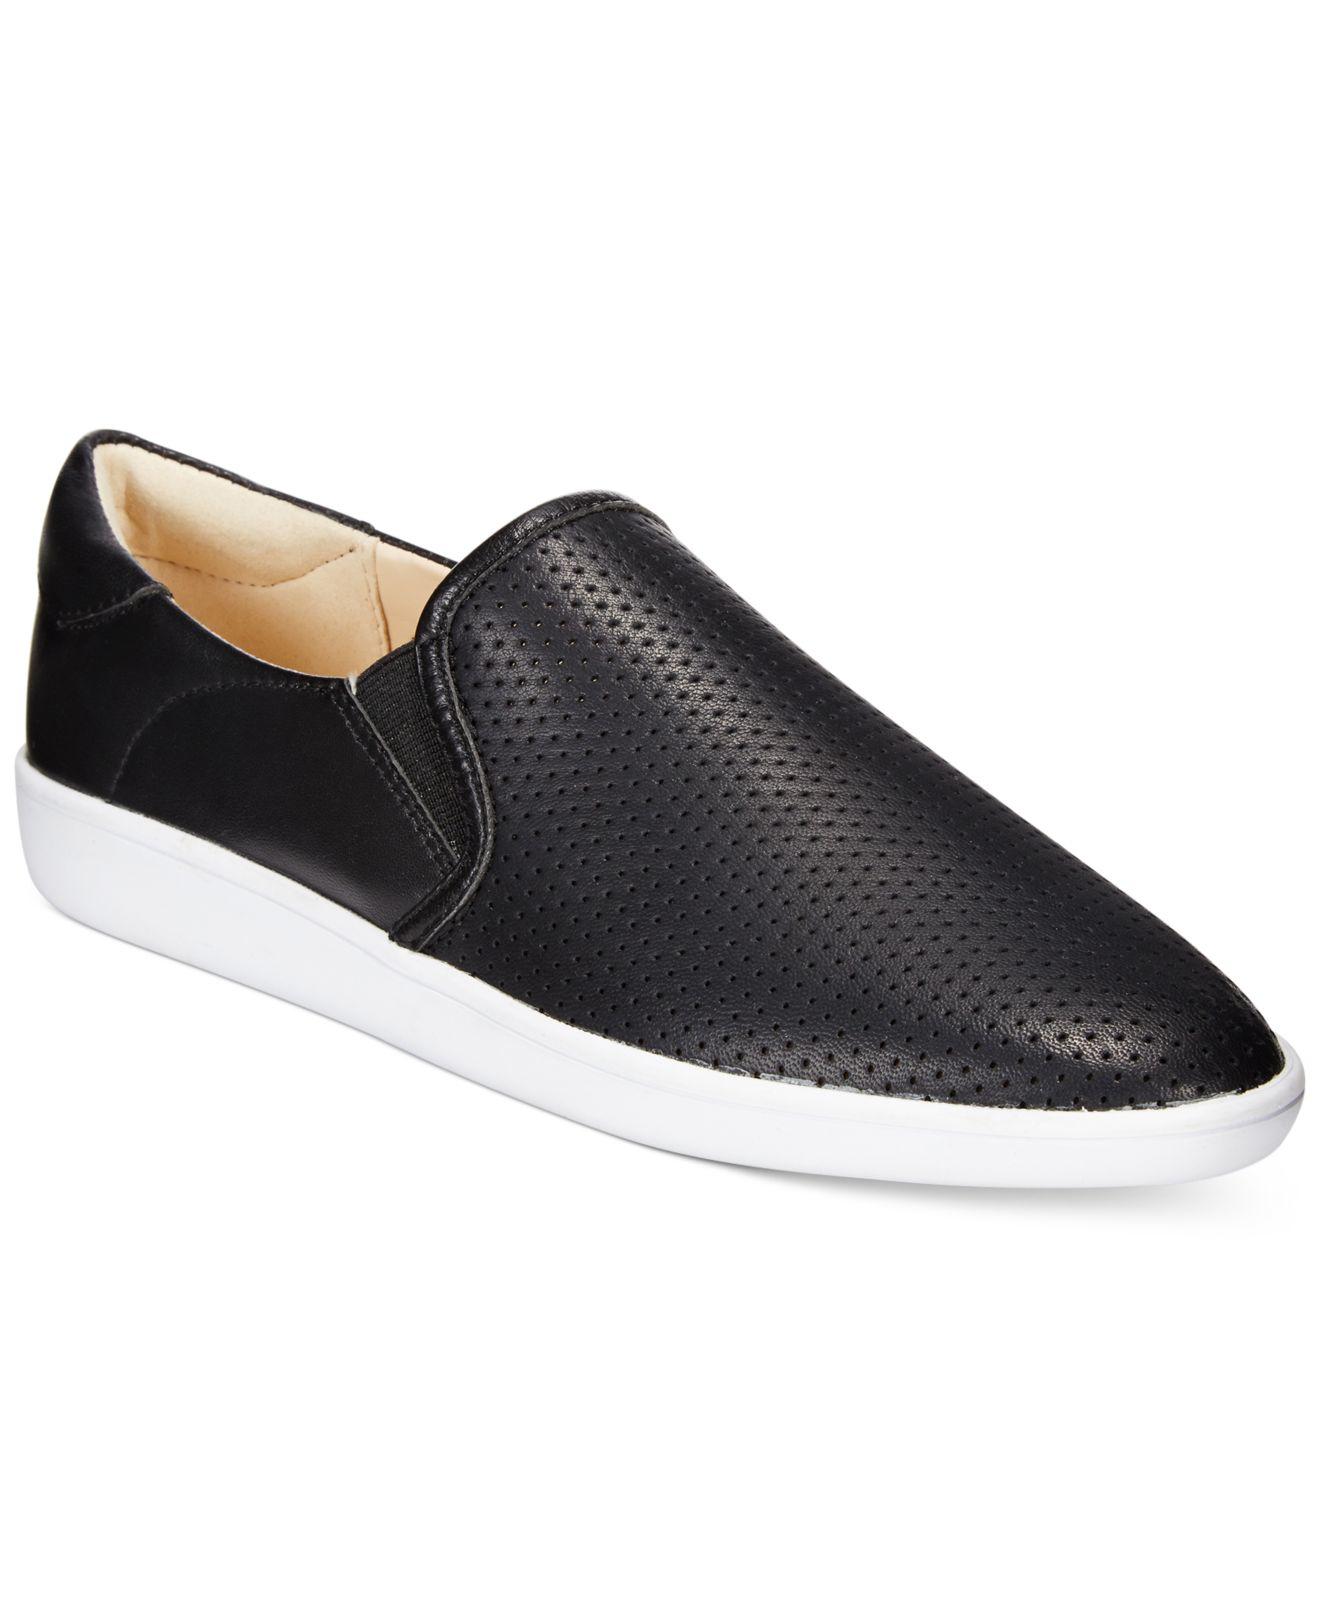 nine west lildevil perforated slip on sneakers in black lyst